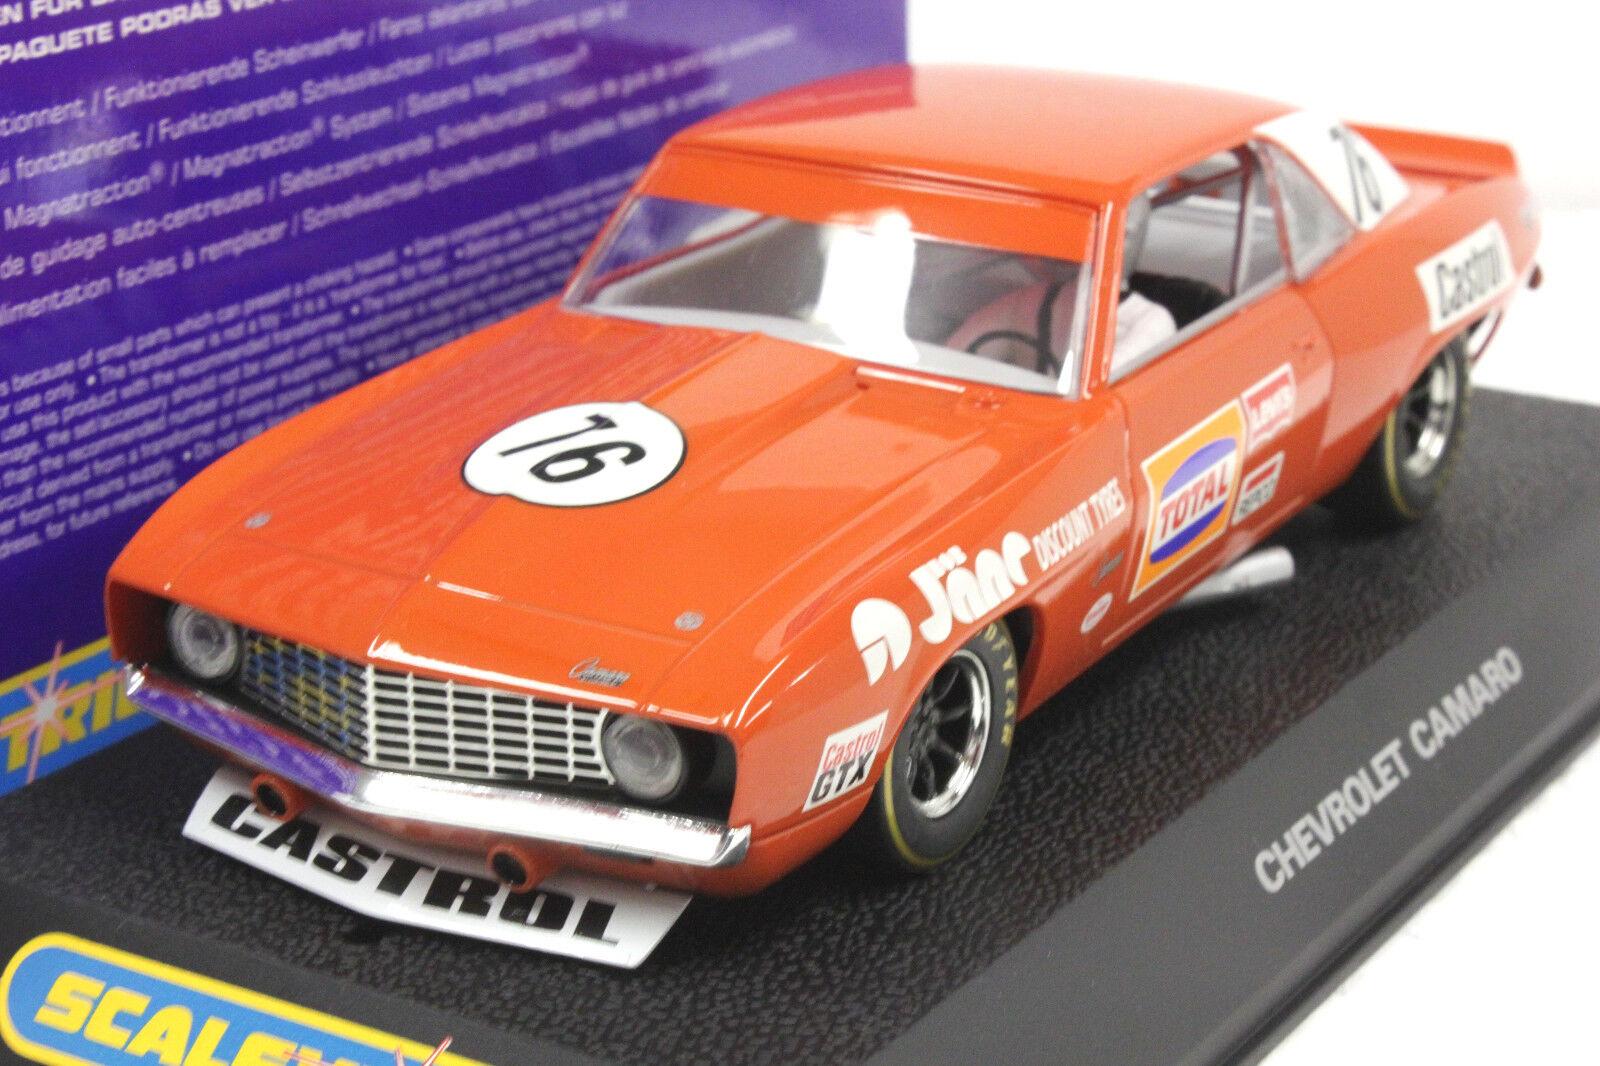 Scalextric C2696 69' Bob Jane Camaro 1 32 ranura de coche nuevo edición limitada-Raro -